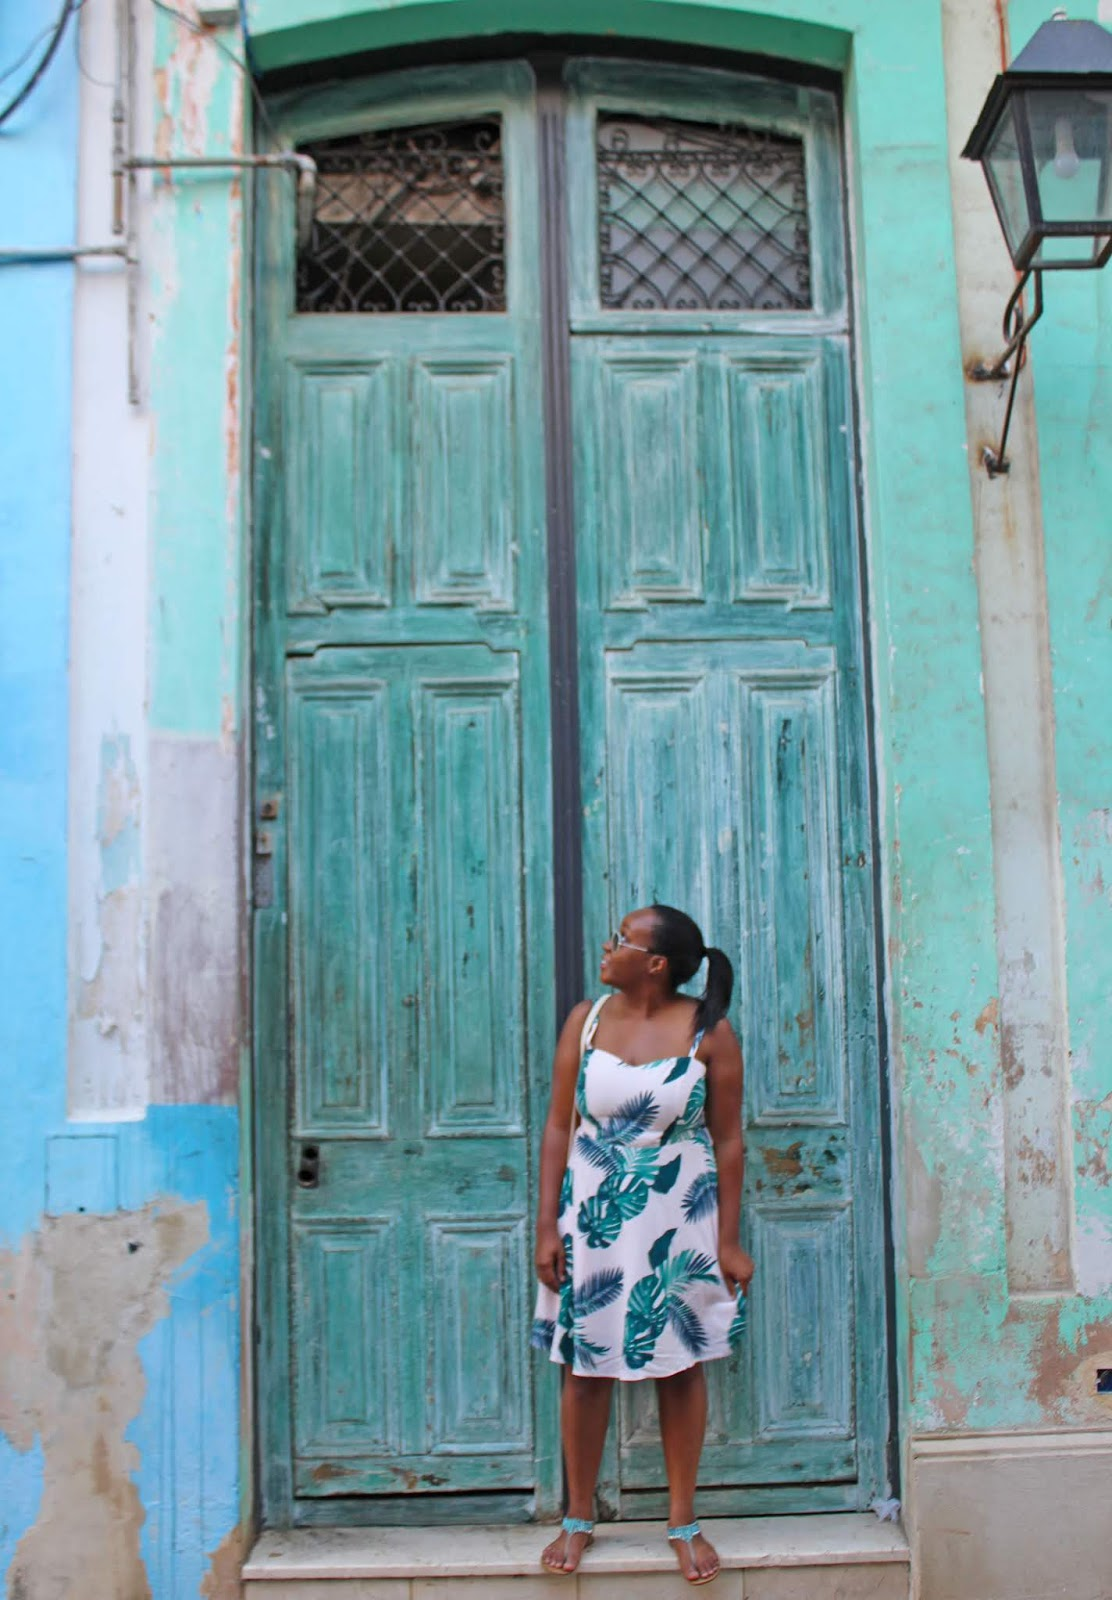 making restorations Havana day 3.1